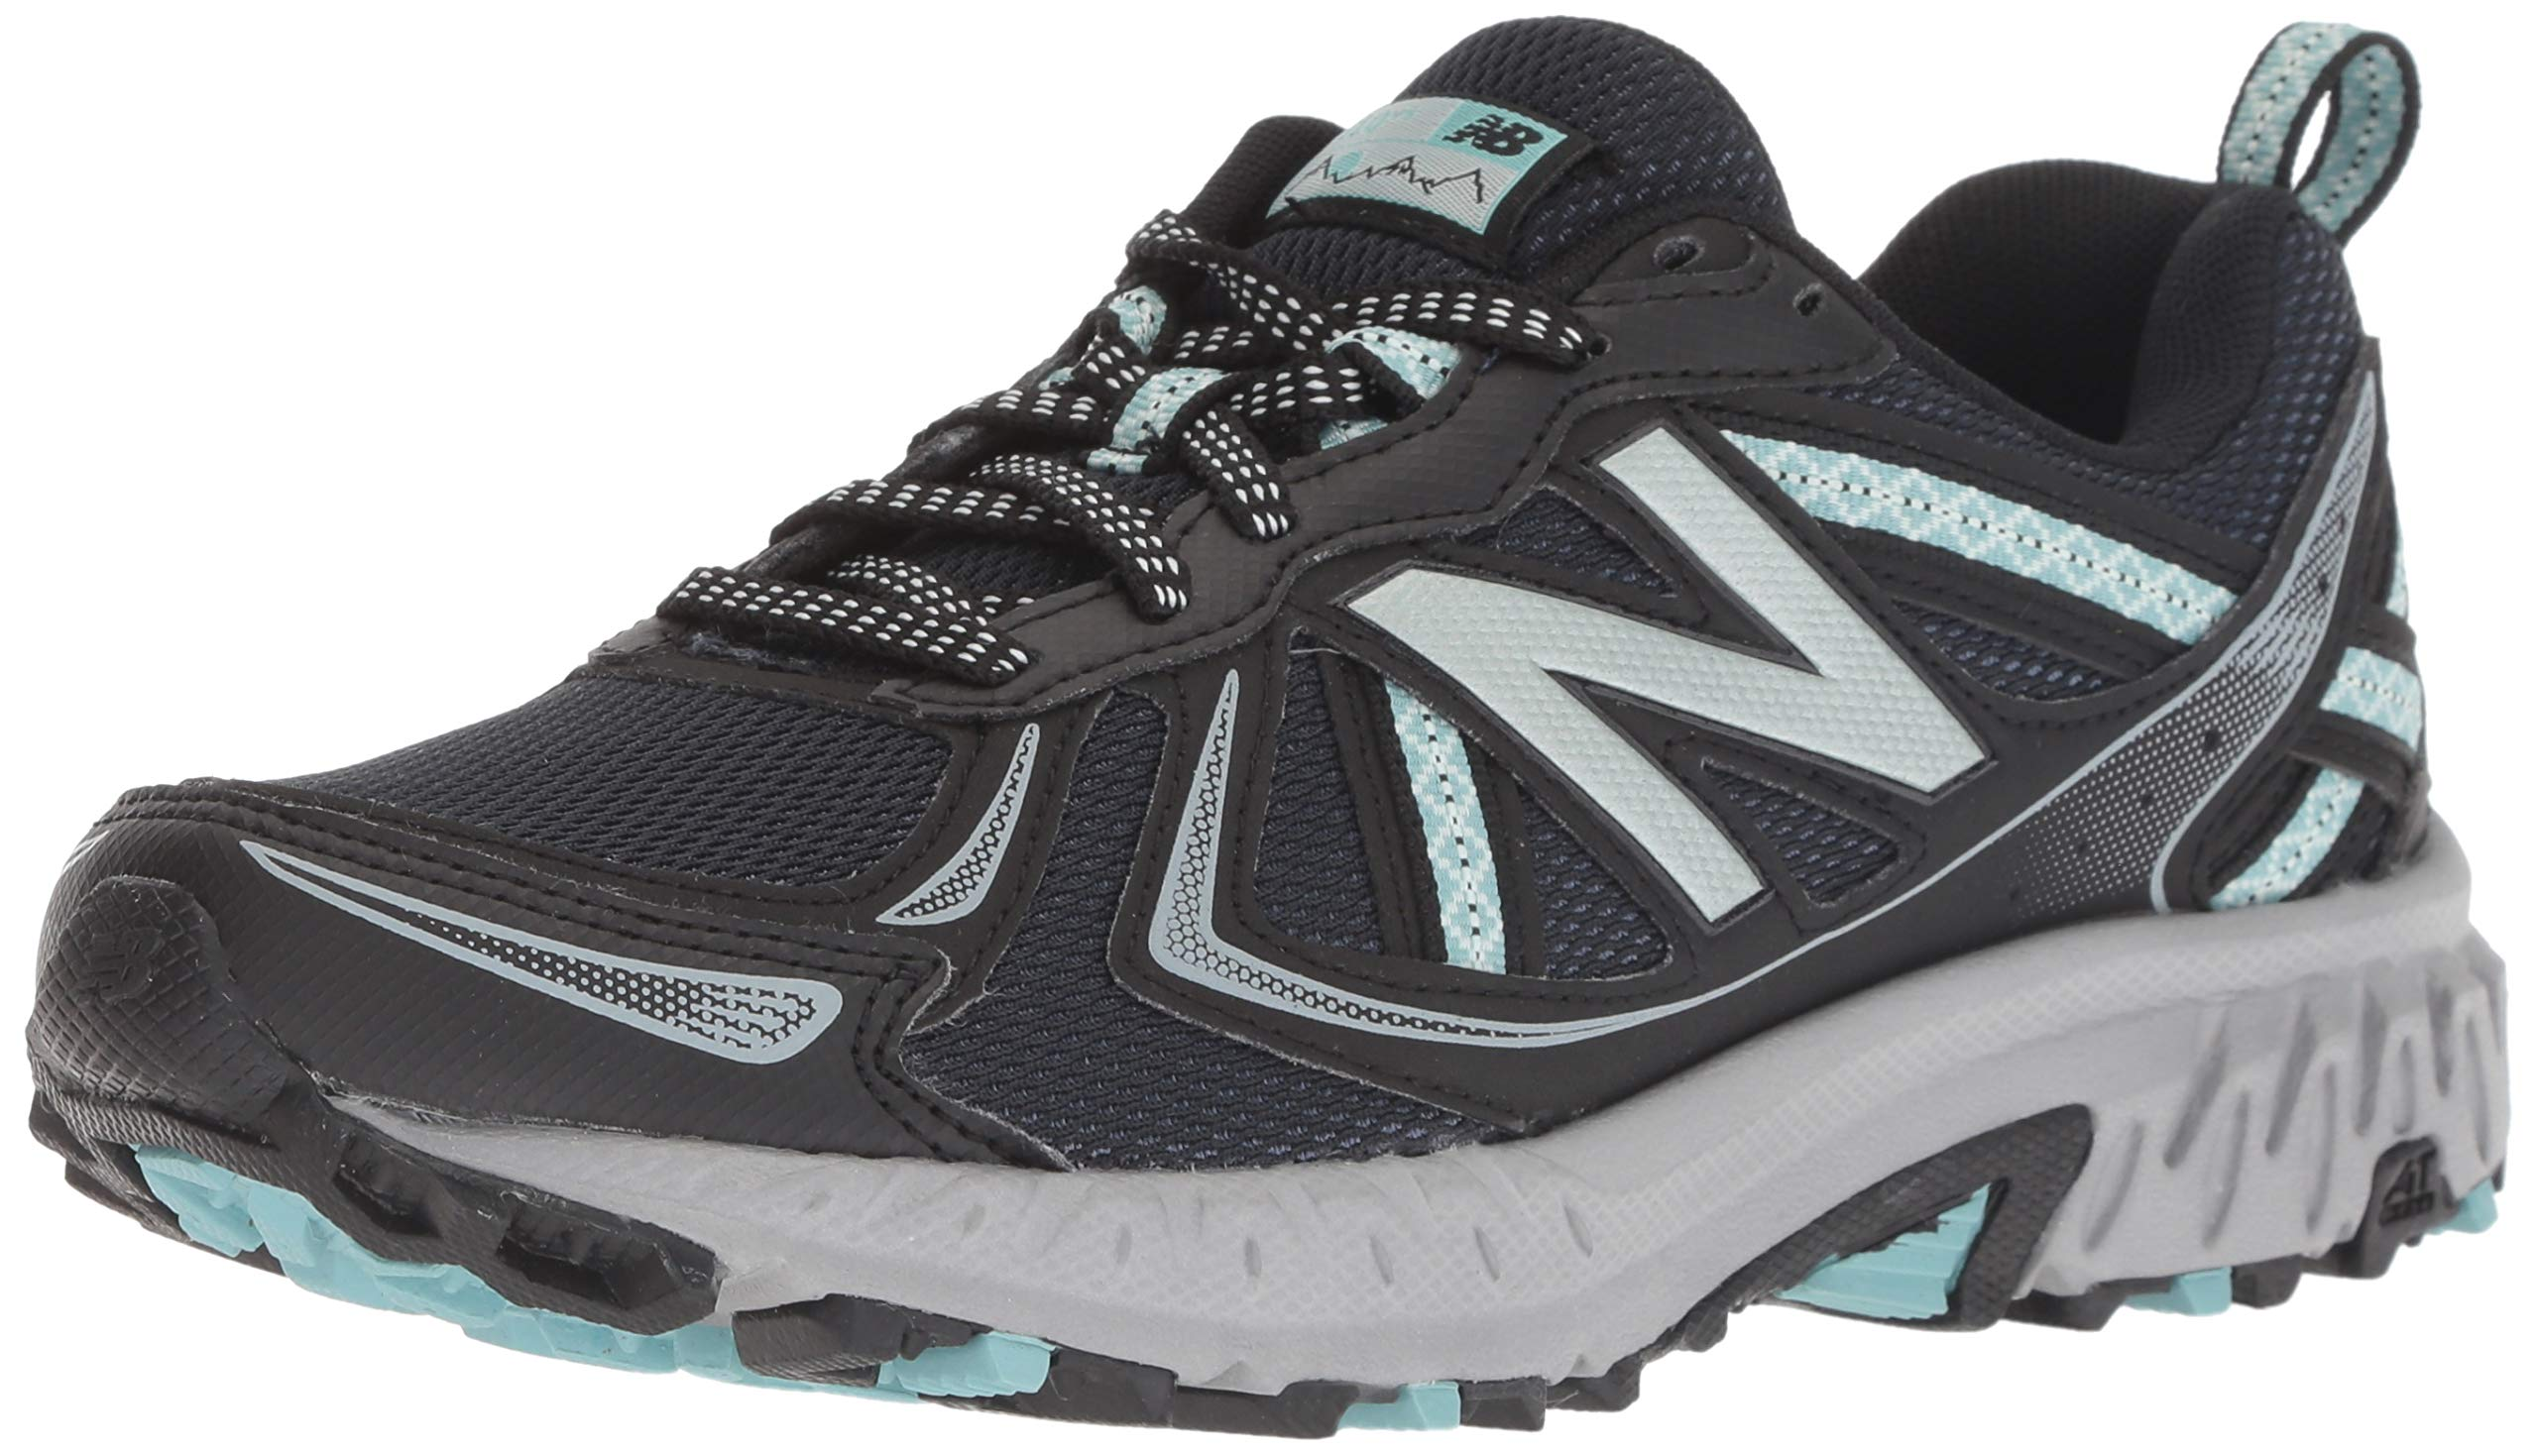 New Balance Women's 410v5 Cushioning Trail Running Shoe, Black/Thunder/Ocean air, 5 B US